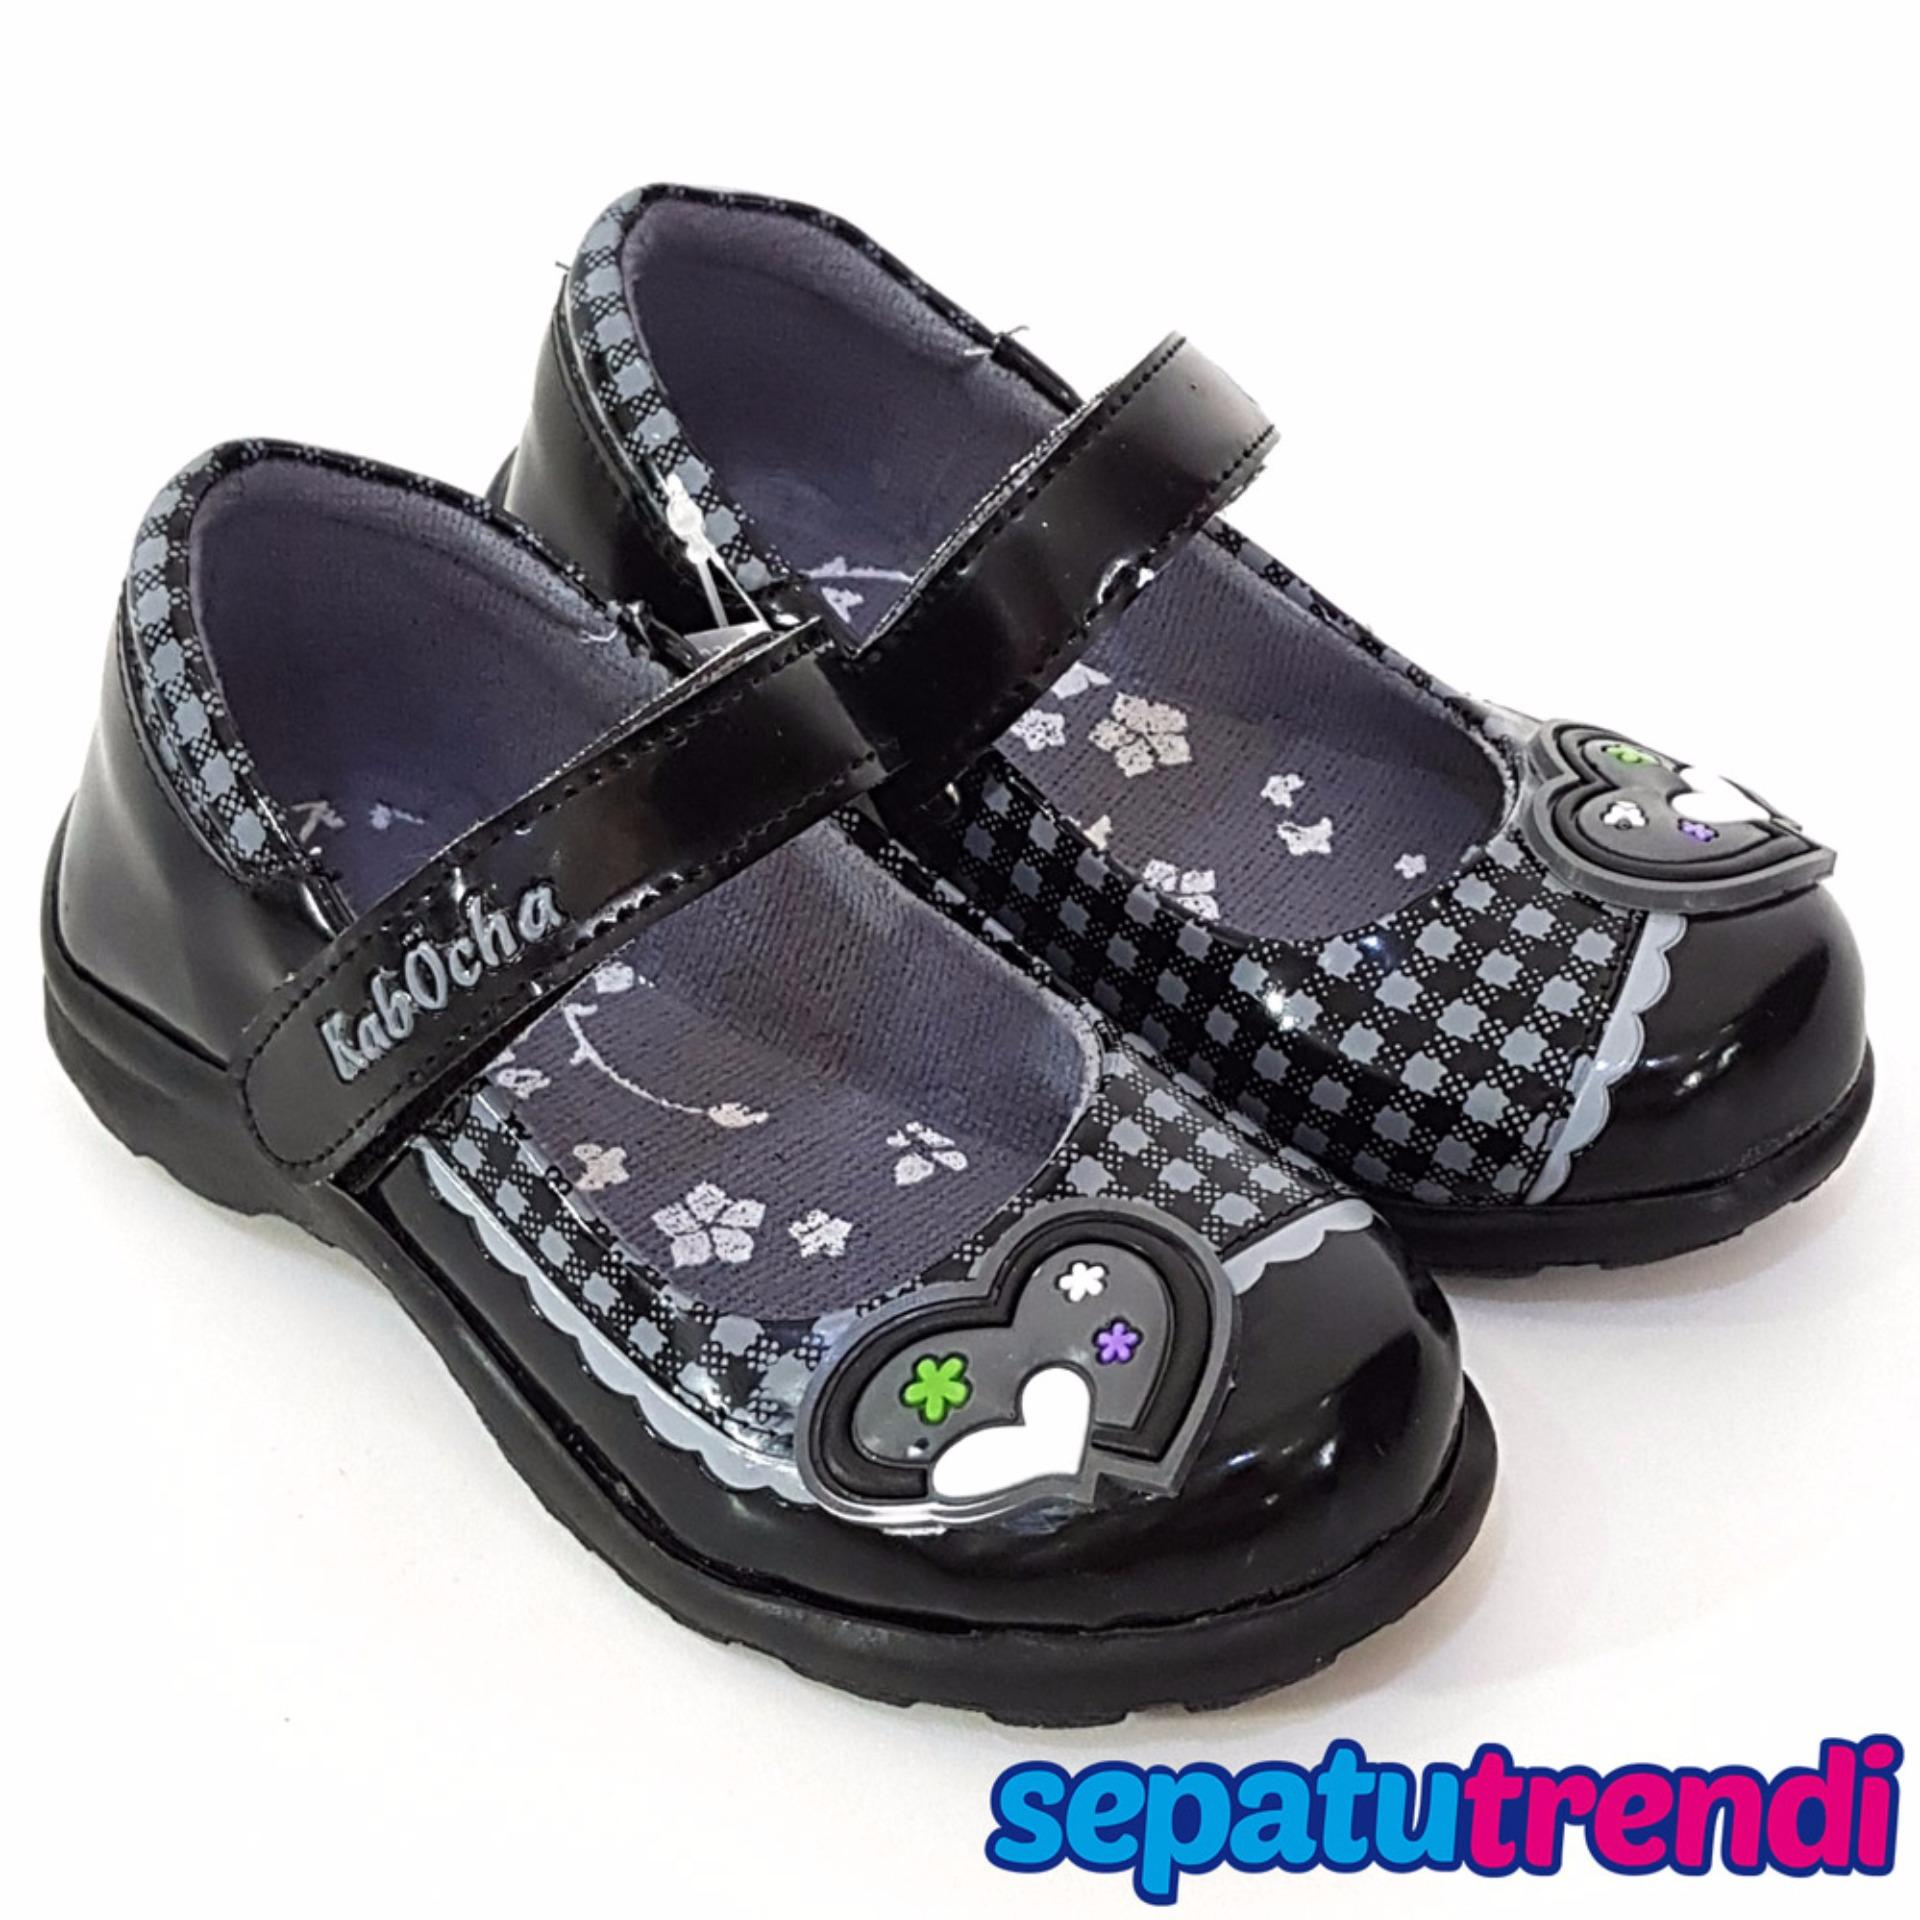 Spesifikasi Trendishoes Sepatu Sekolah Anak Perempuan Mary Jane Motif Boneka Random Kvb01 Hitam Trendishoes Terbaru